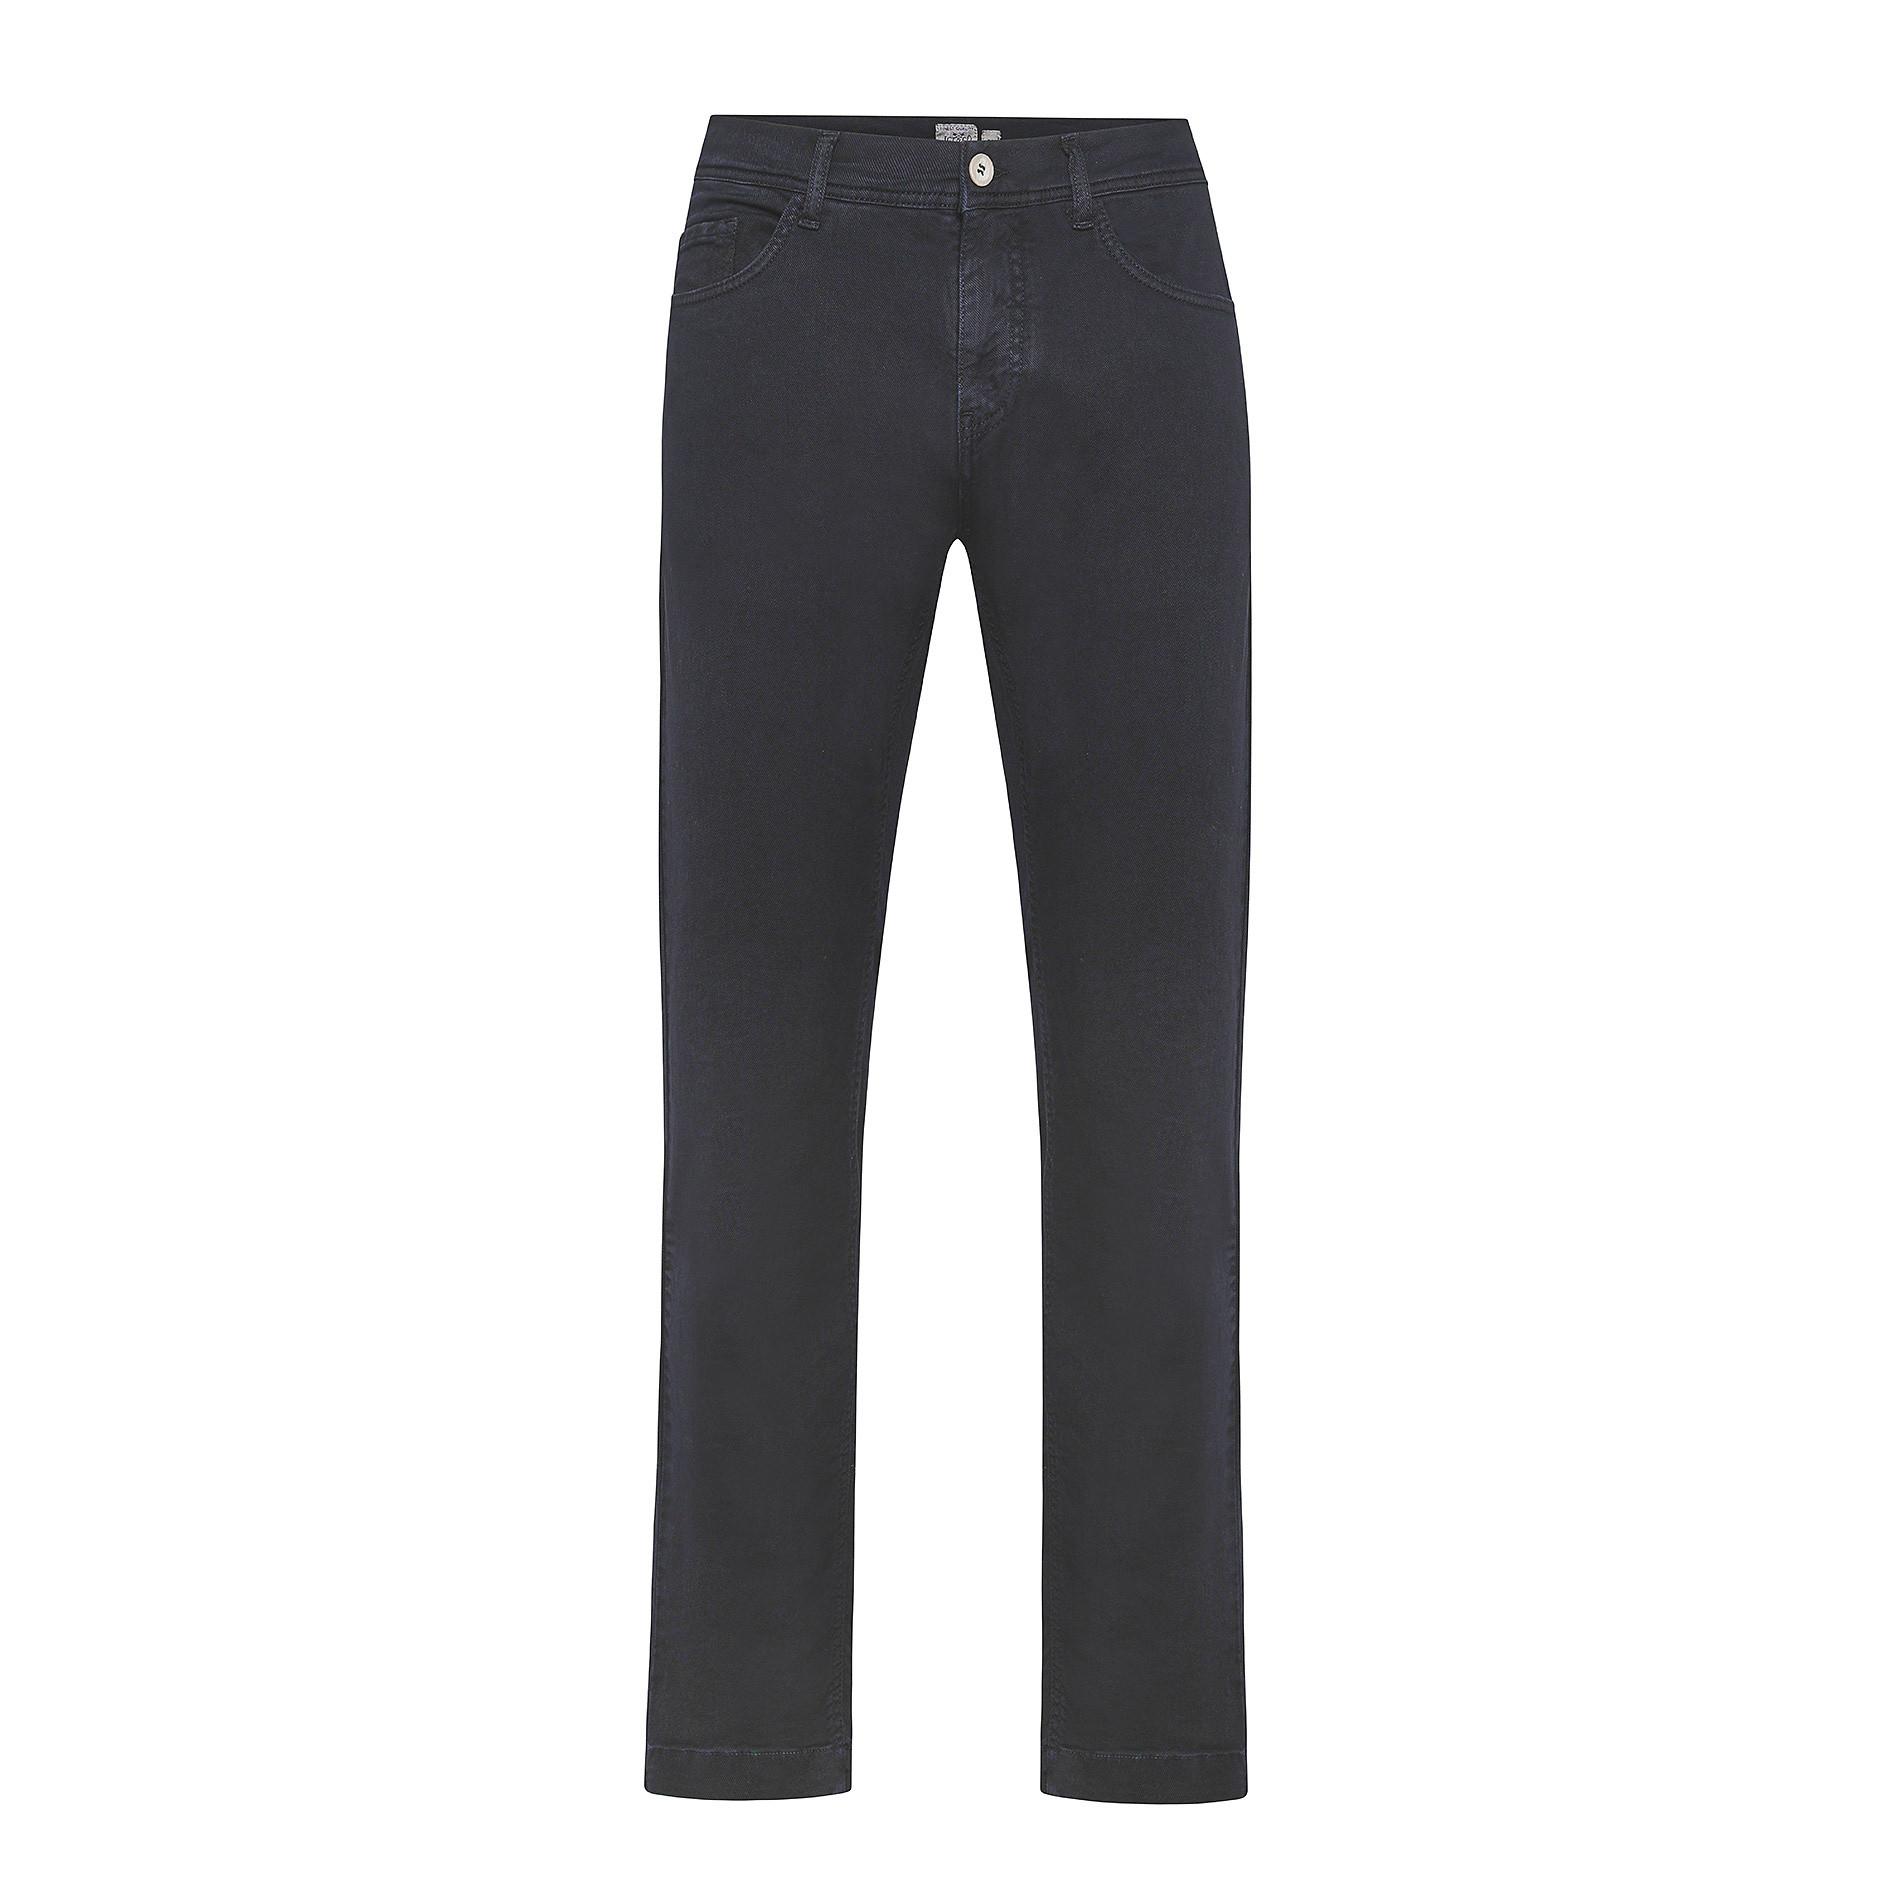 Pantalone cotone stretch 5 tasche JCT, Blu scuro, large image number 0